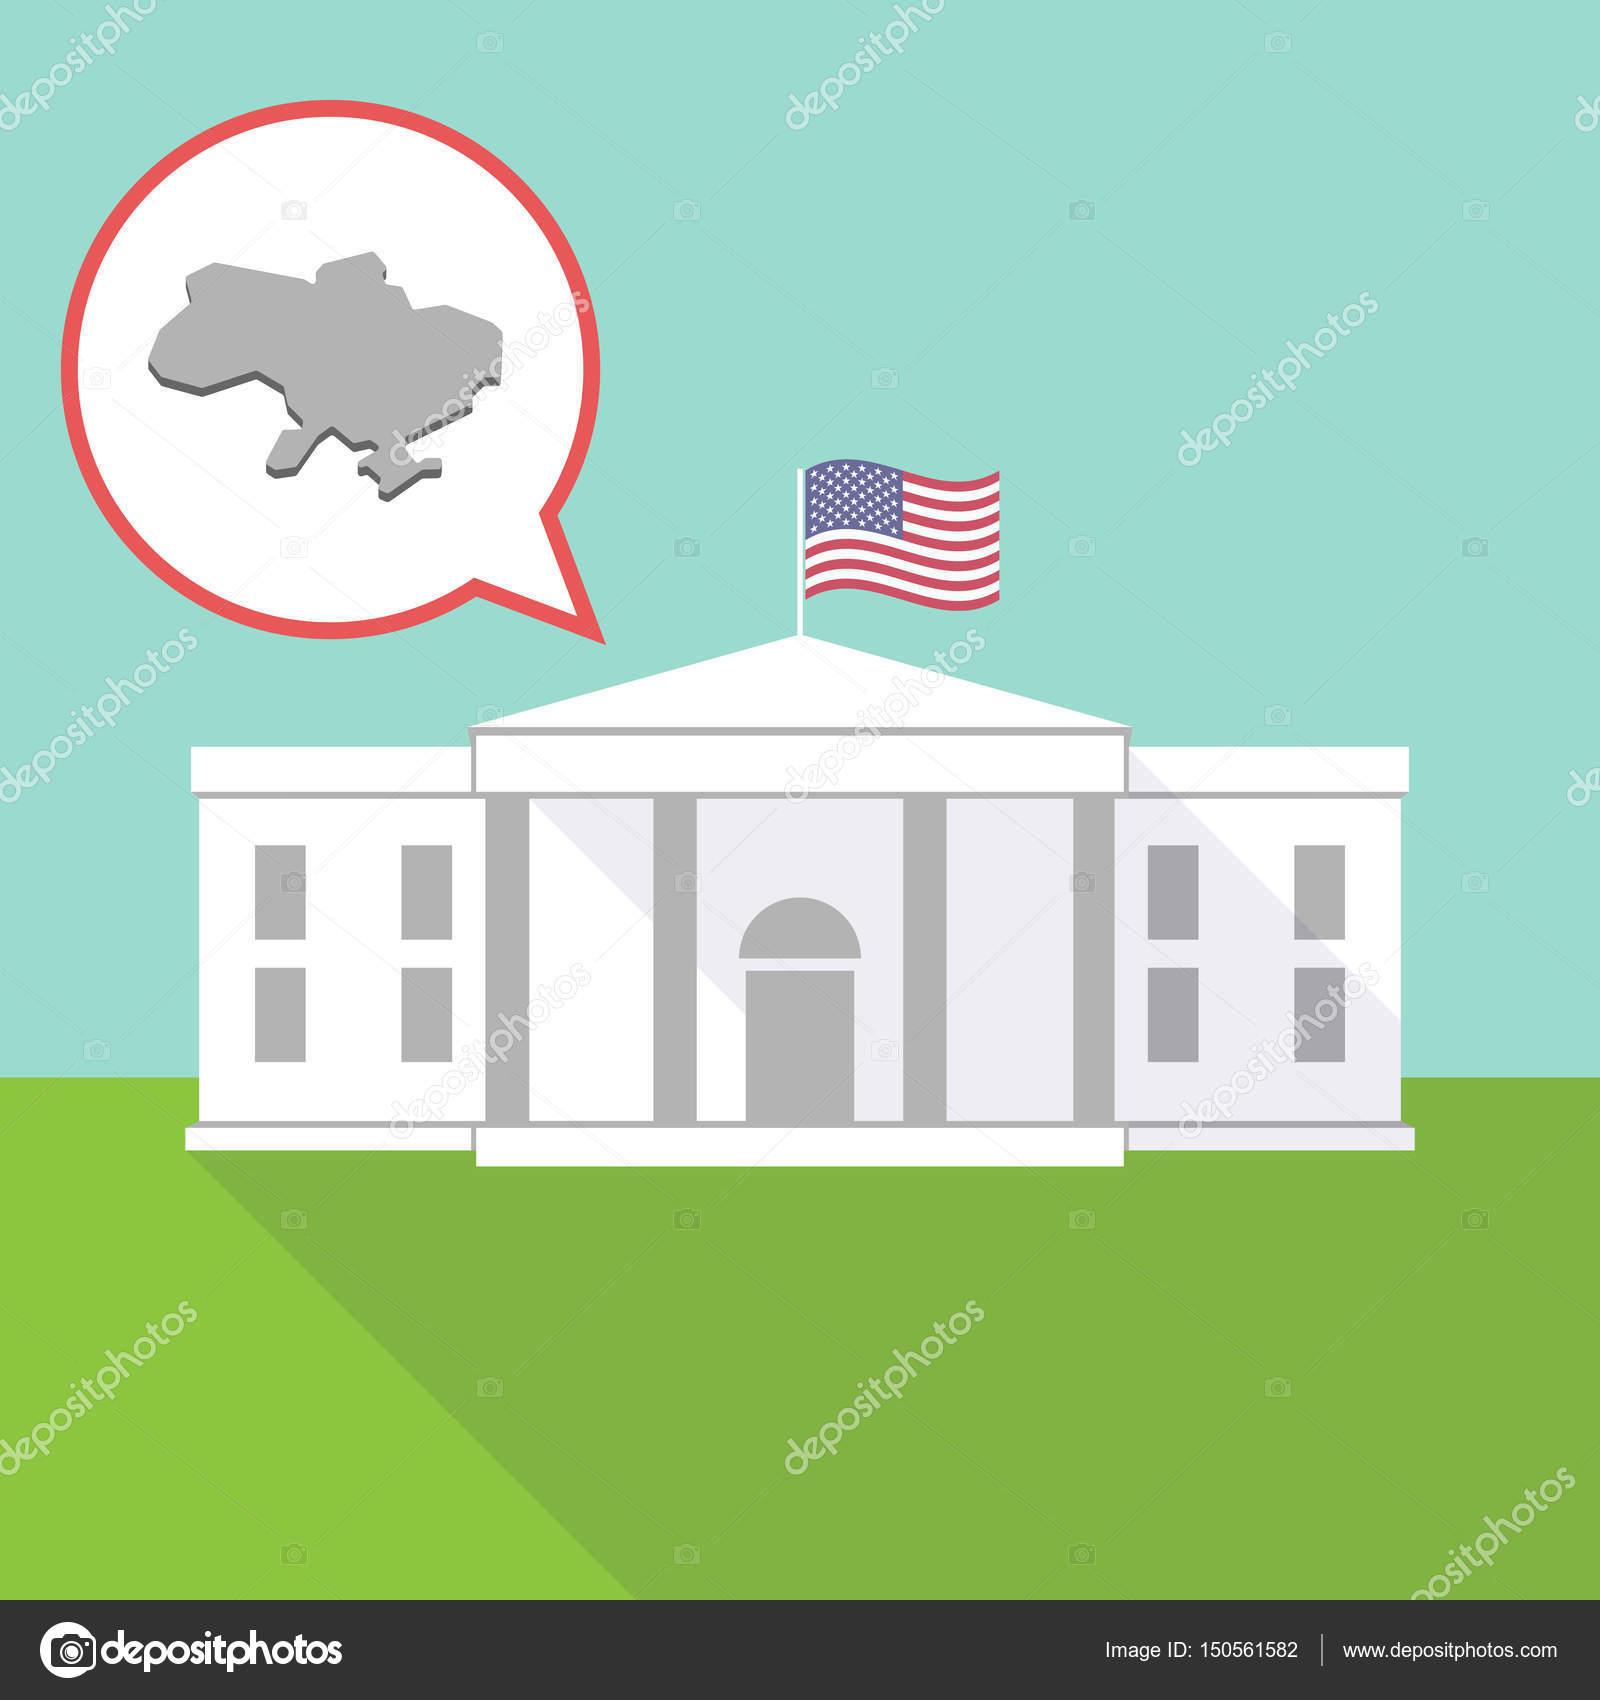 vita huset karta Vita huset med karta över Ukraina — Stock Vektor © on #150561582 vita huset karta